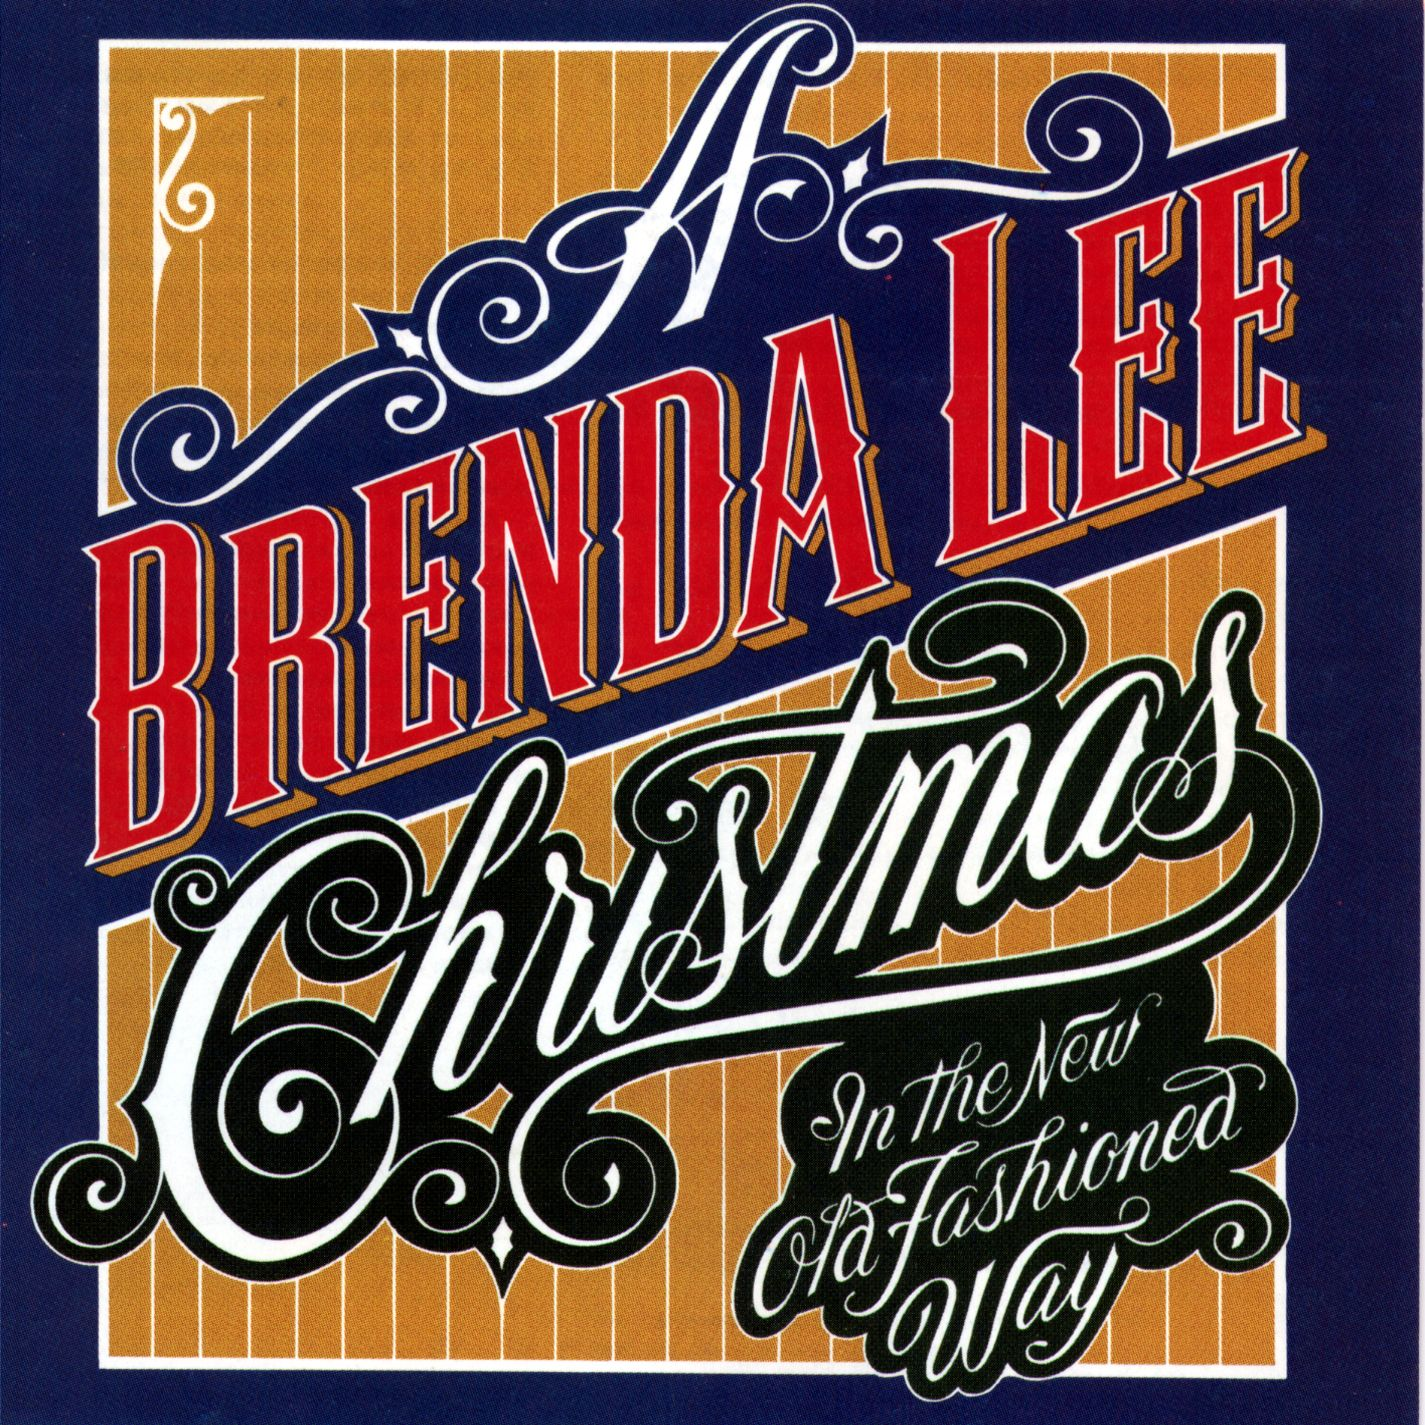 Listen Free to Brenda Lee - Rockin' Around the Christmas Tree Radio | iHeartRadio